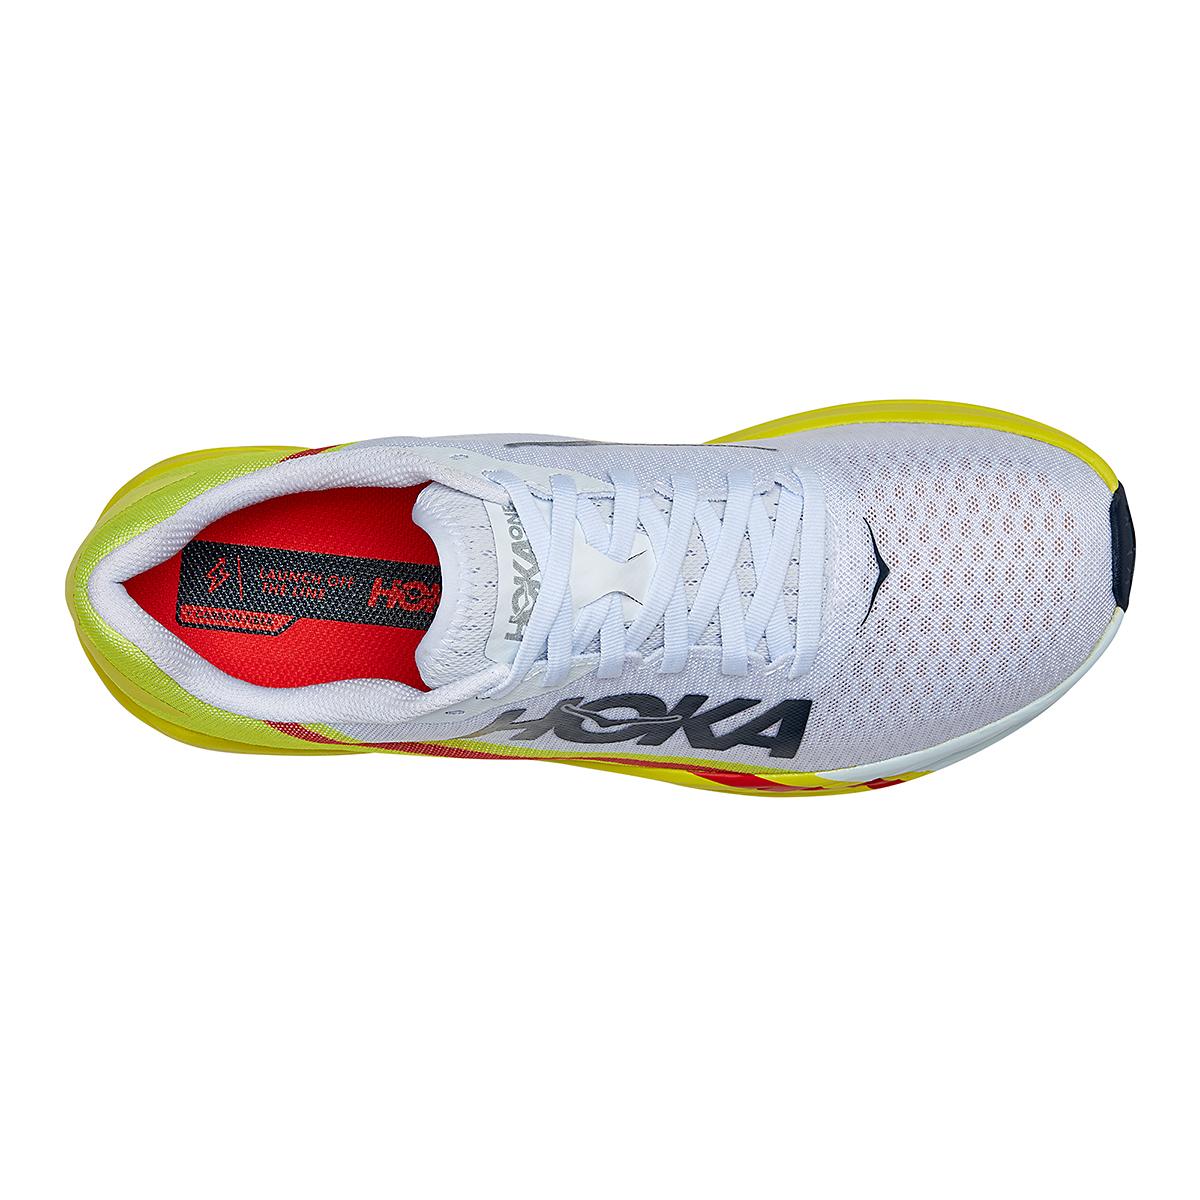 Men's Hoka One One Rocket X Running Shoe - Color: White/Evening Primrose - Size: 8.5 - Width: Regular, White/Evening Primrose, large, image 5